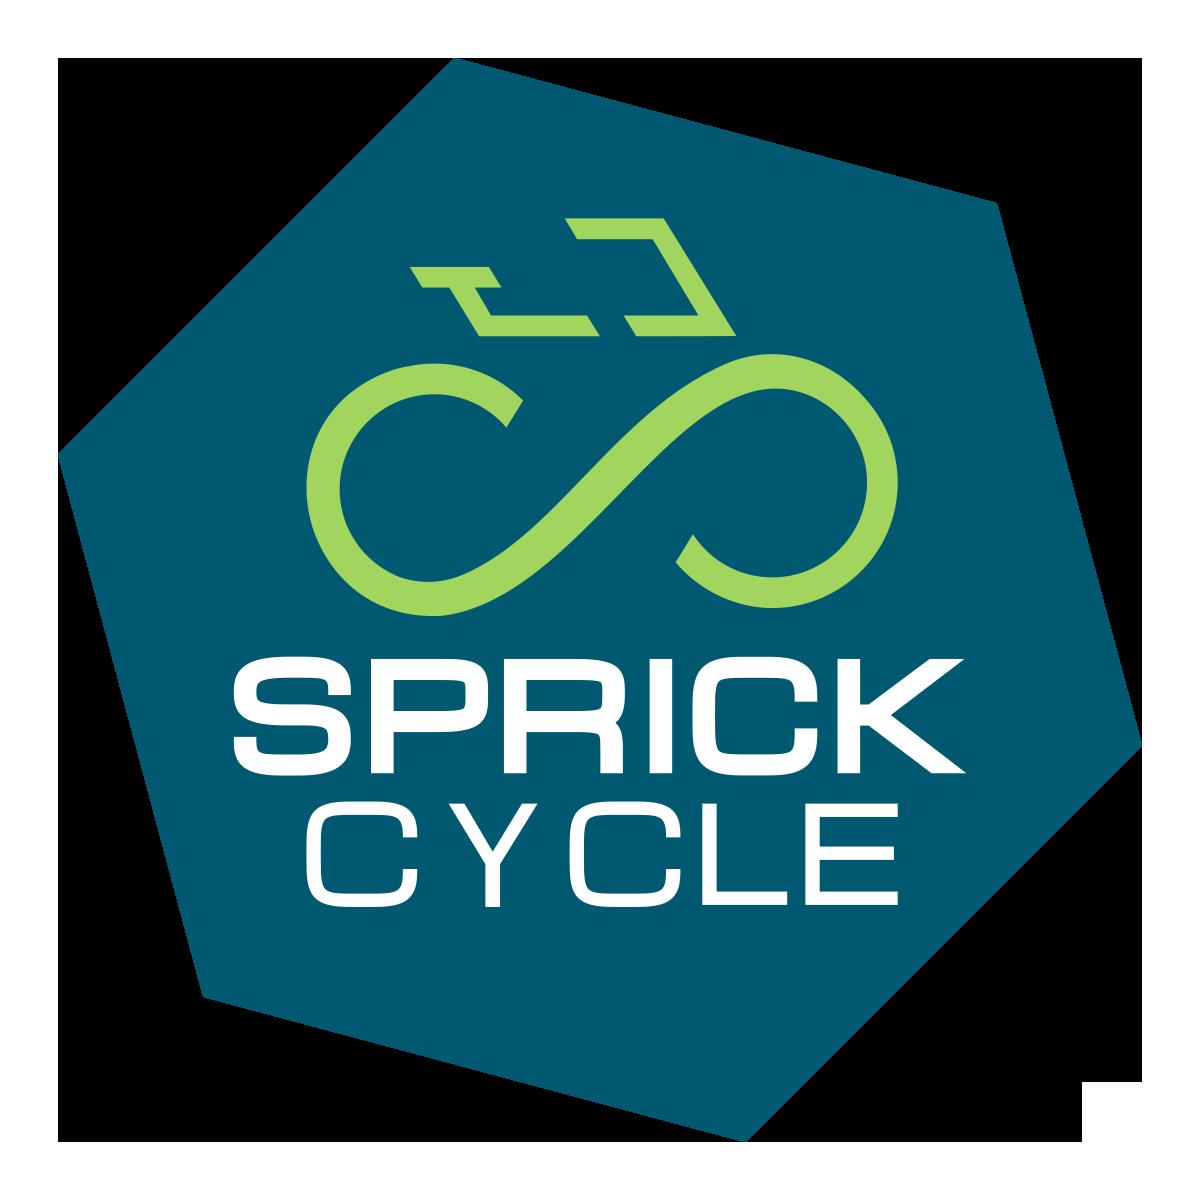 SPRICK CYCLE GmbH